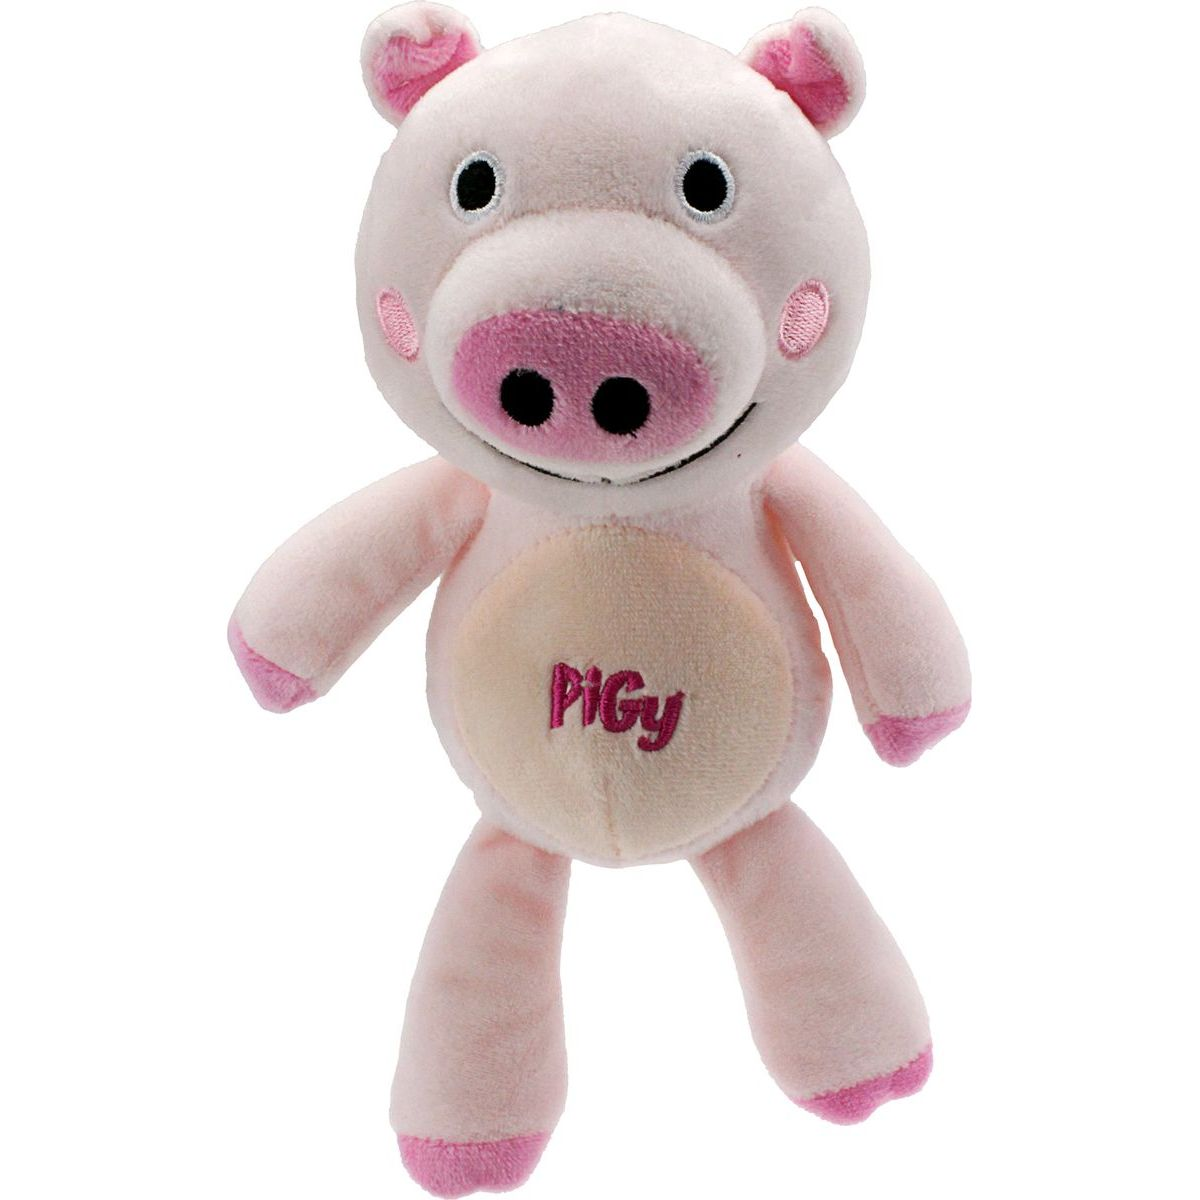 Prasiatko Pigy plyš 17cm